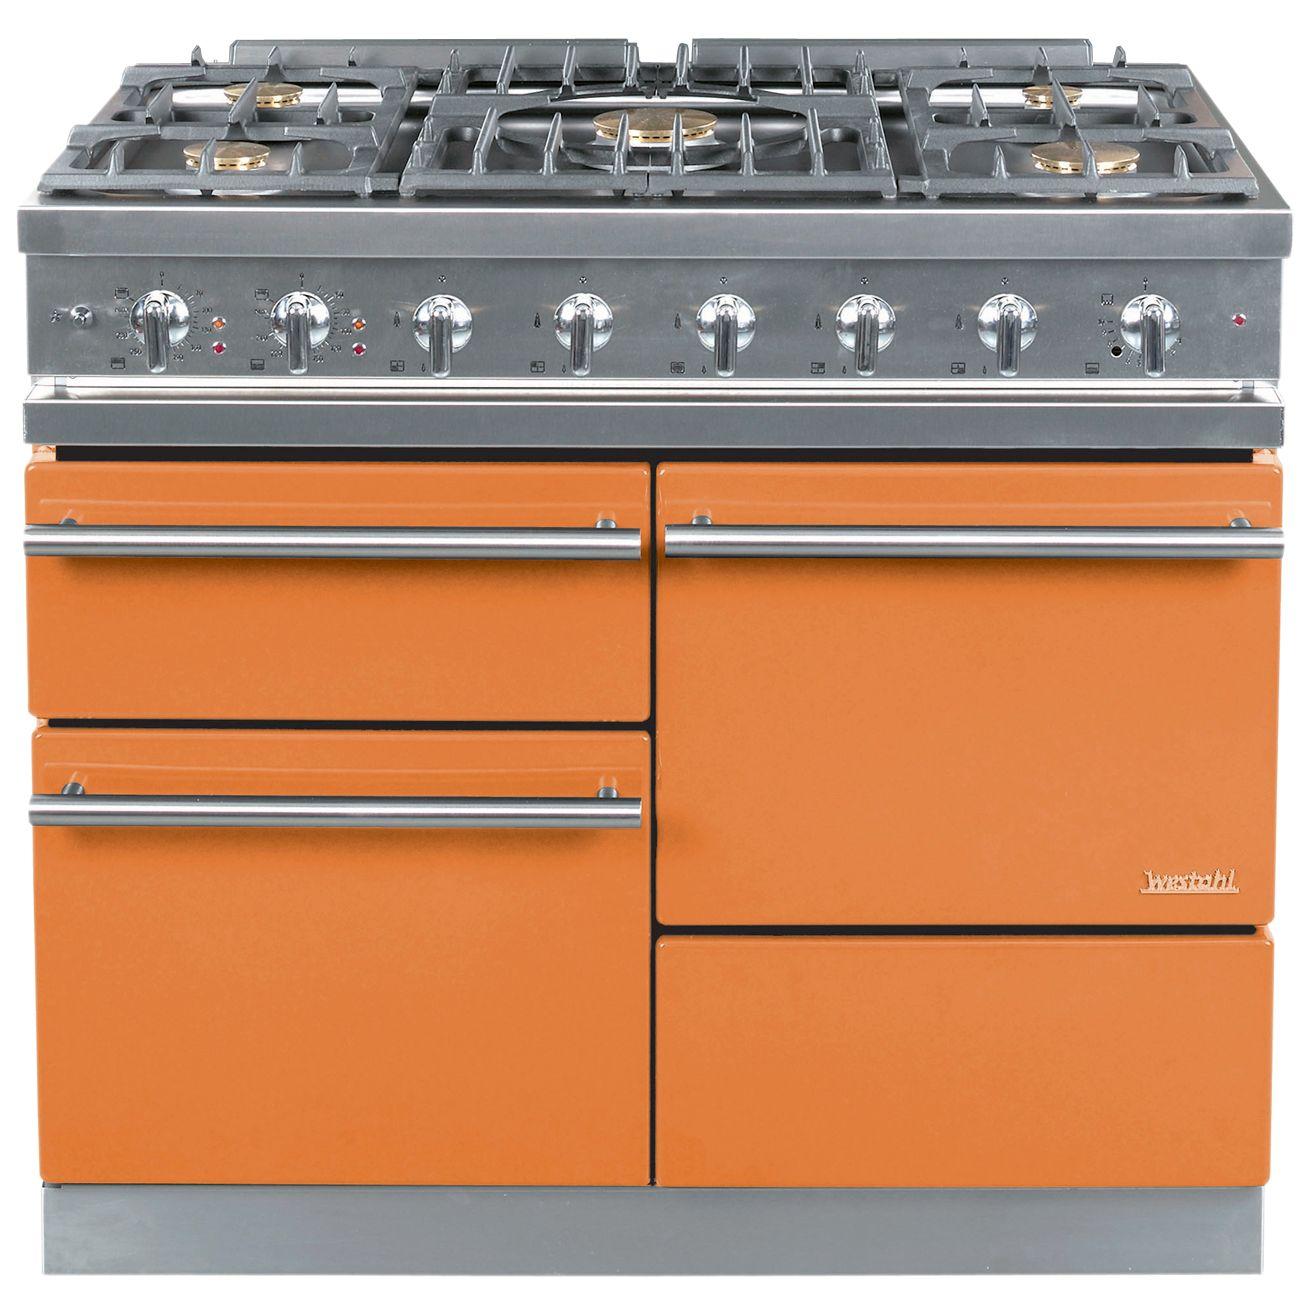 Westahl Macon WG1053GECT Dual Fuel Cooker, Mandarin at John Lewis